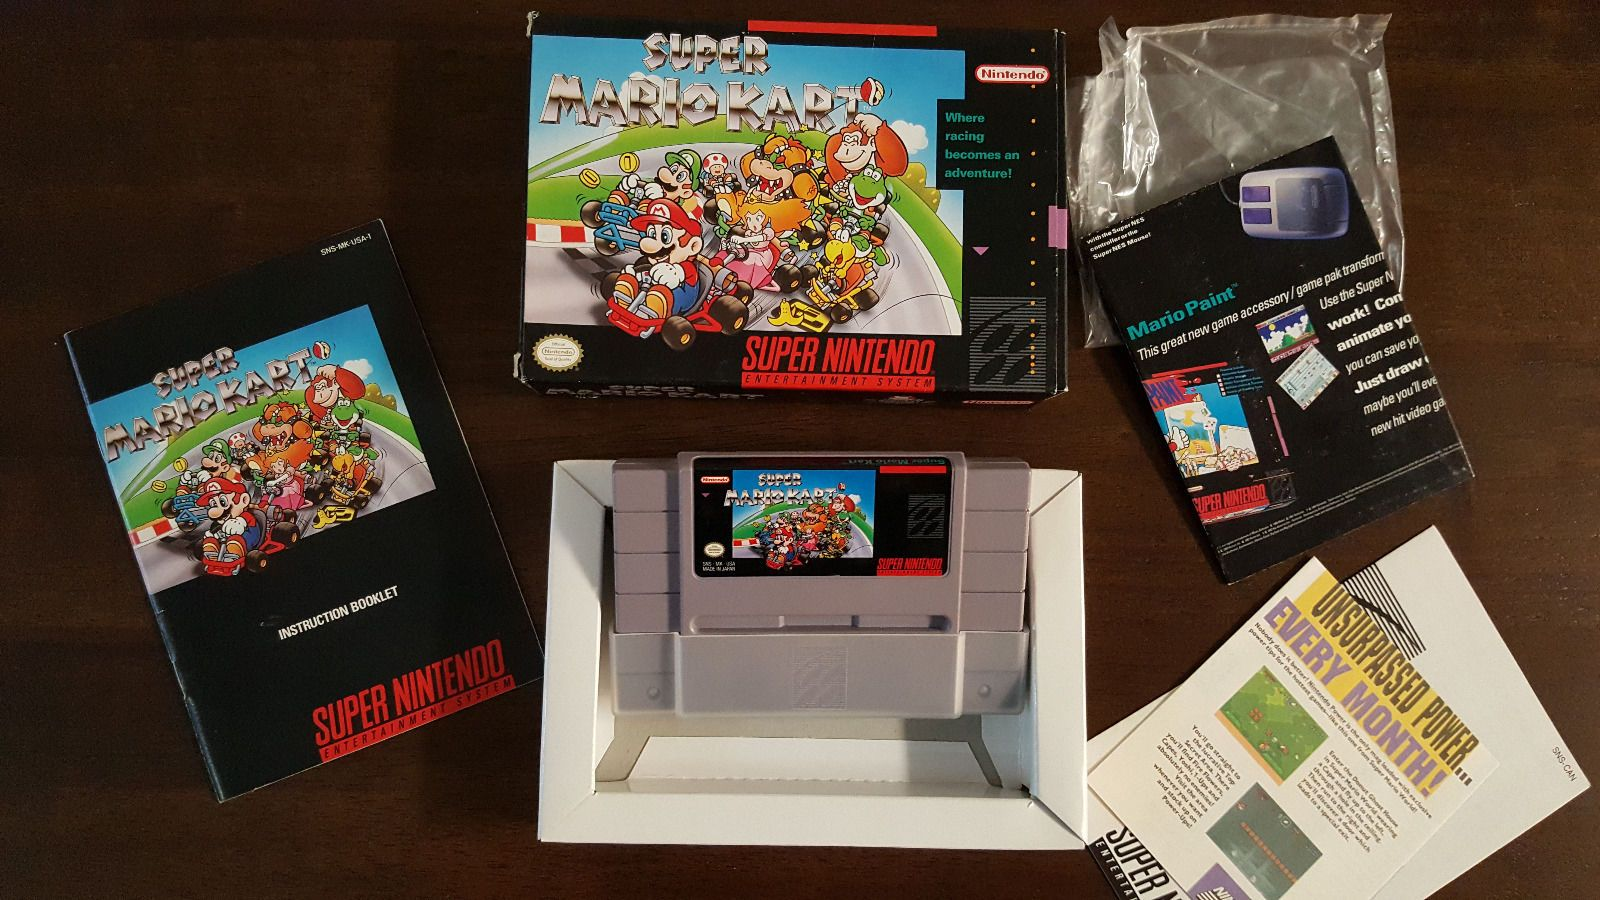 awesome super mario kart cib 100 collector complete box manual rh pinterest com Super Mario RPG SNES Super Mario All-Stars SNES